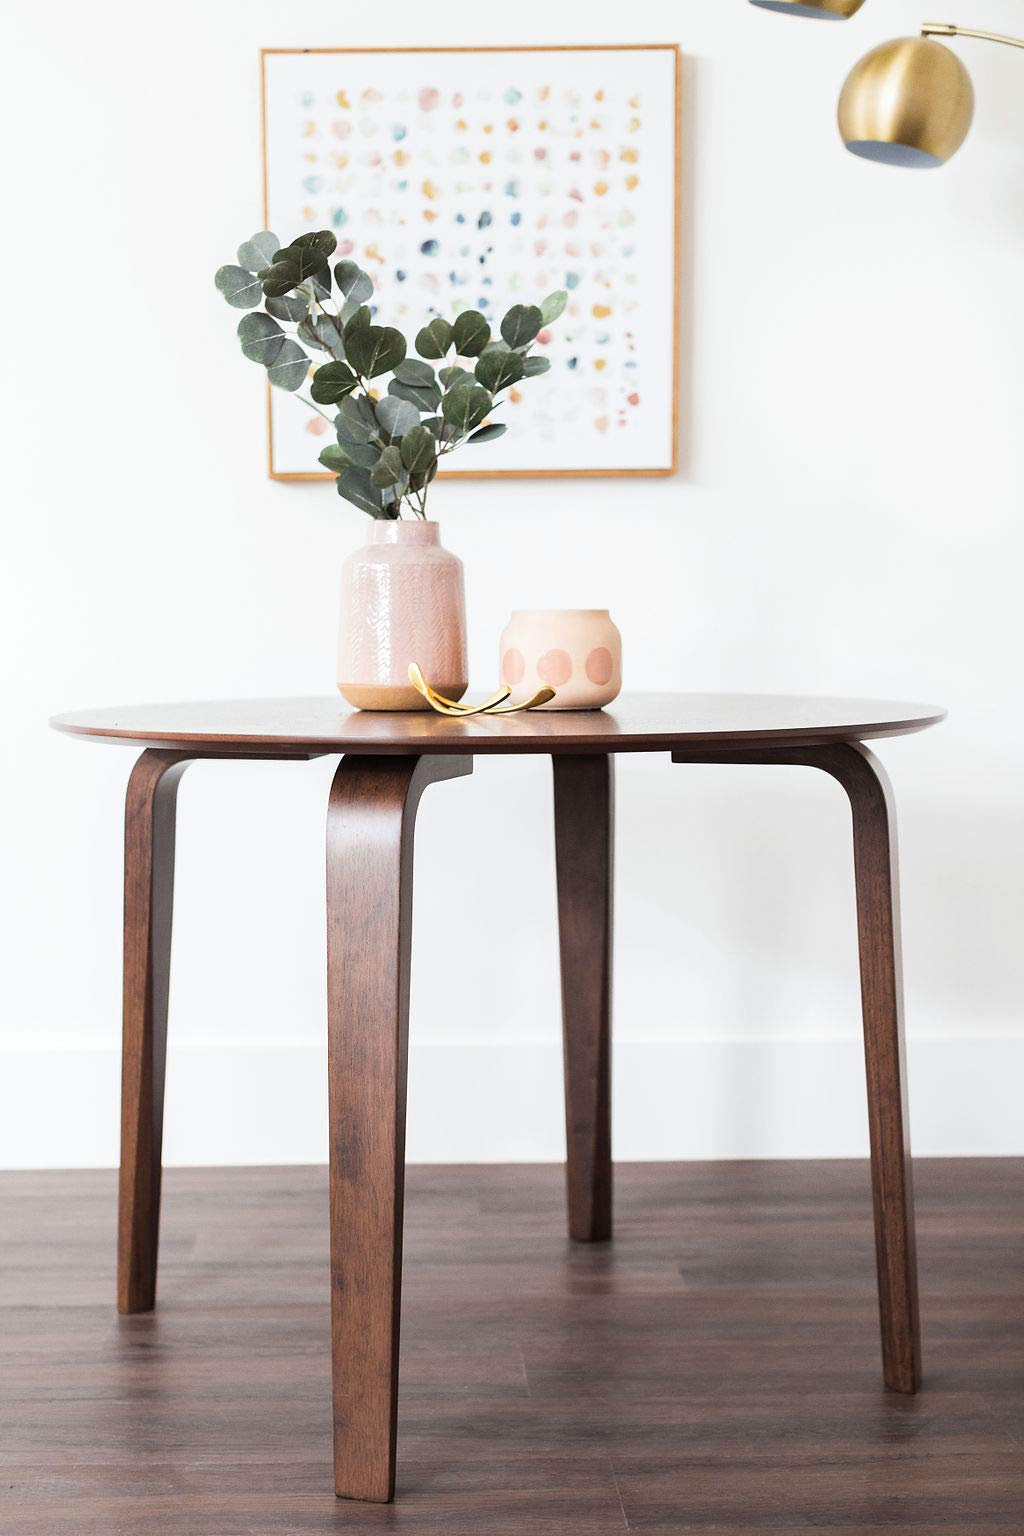 Edloe Finch YUMI Mid-Century Modern Round Dining Table Kitchen Walnut by Edloe Finch (Image #2)